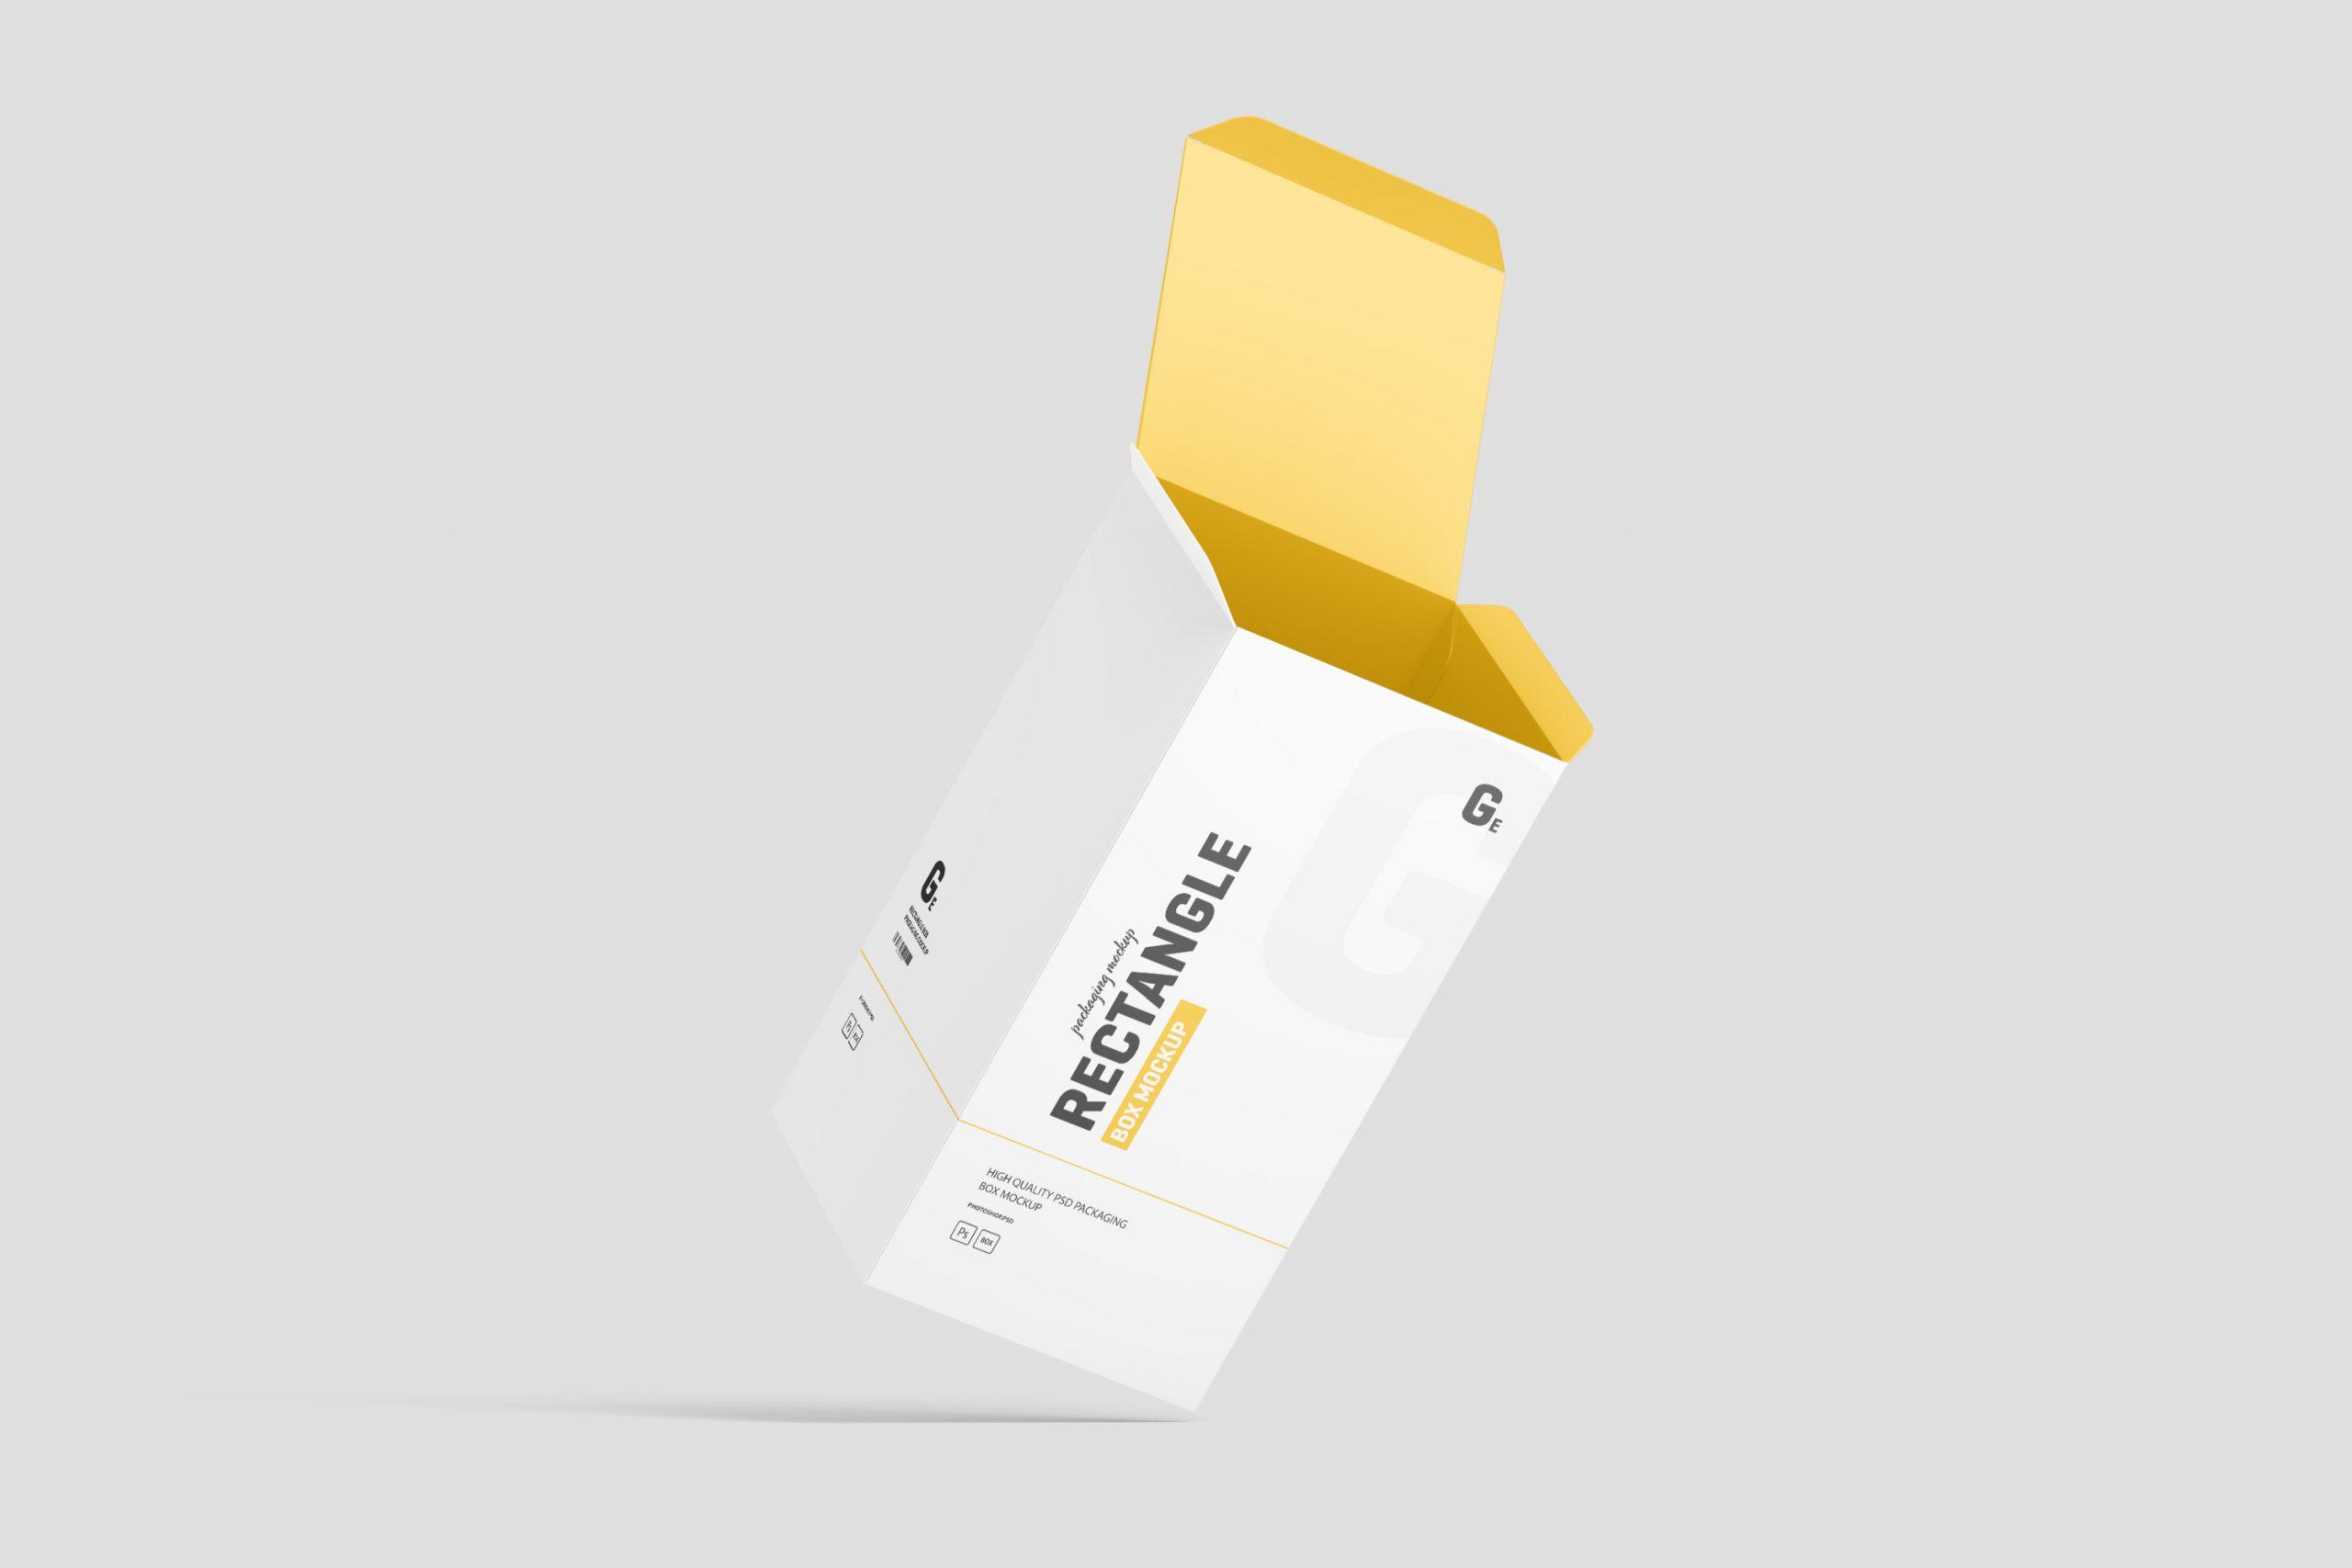 Rectangle Box Packaging Mockup